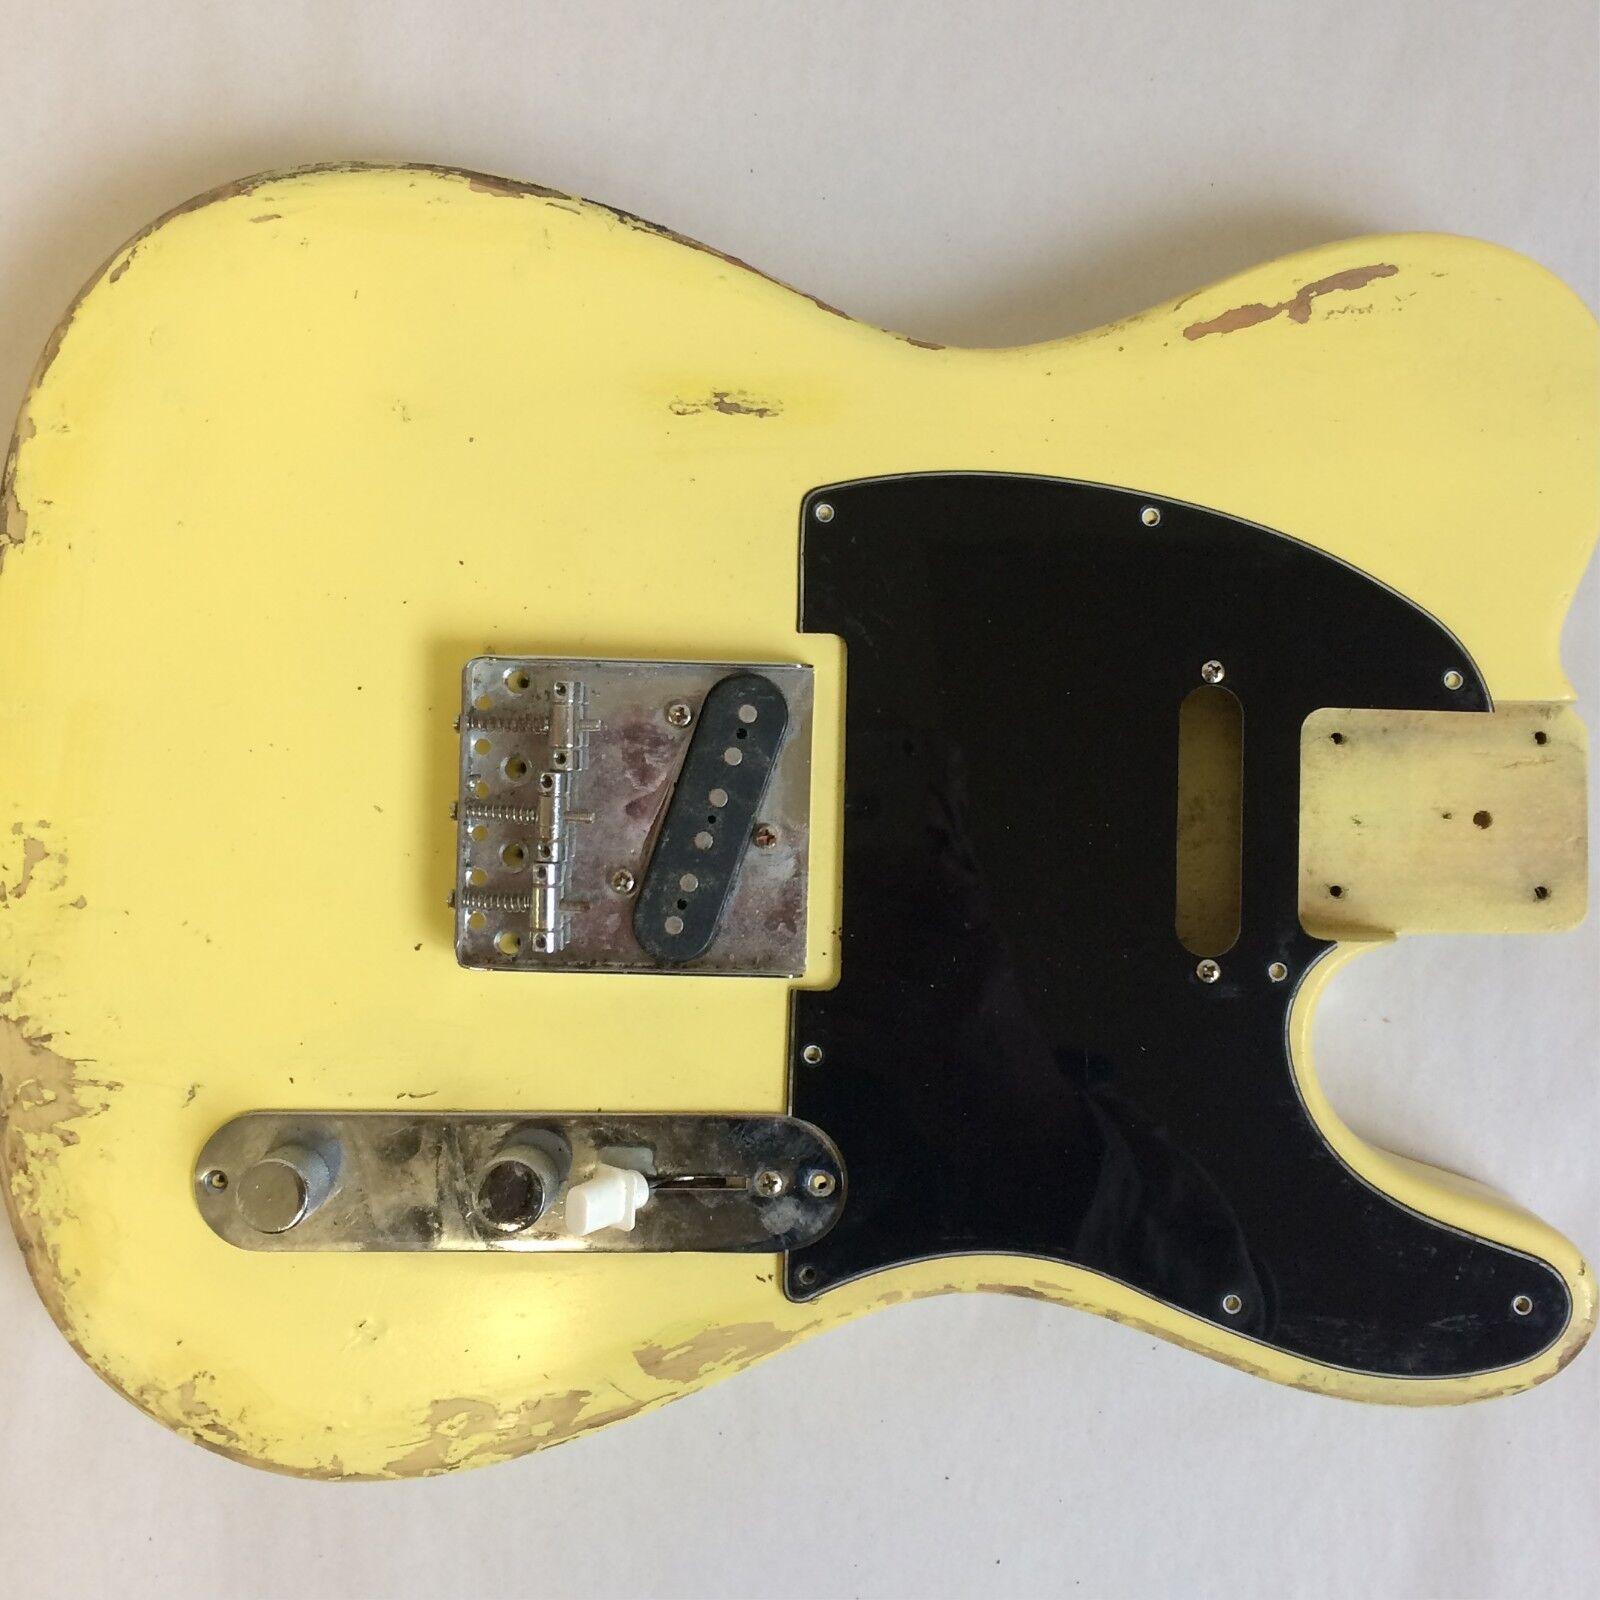 Telecaster relic guitar bodies. NGS Guitars Blausman